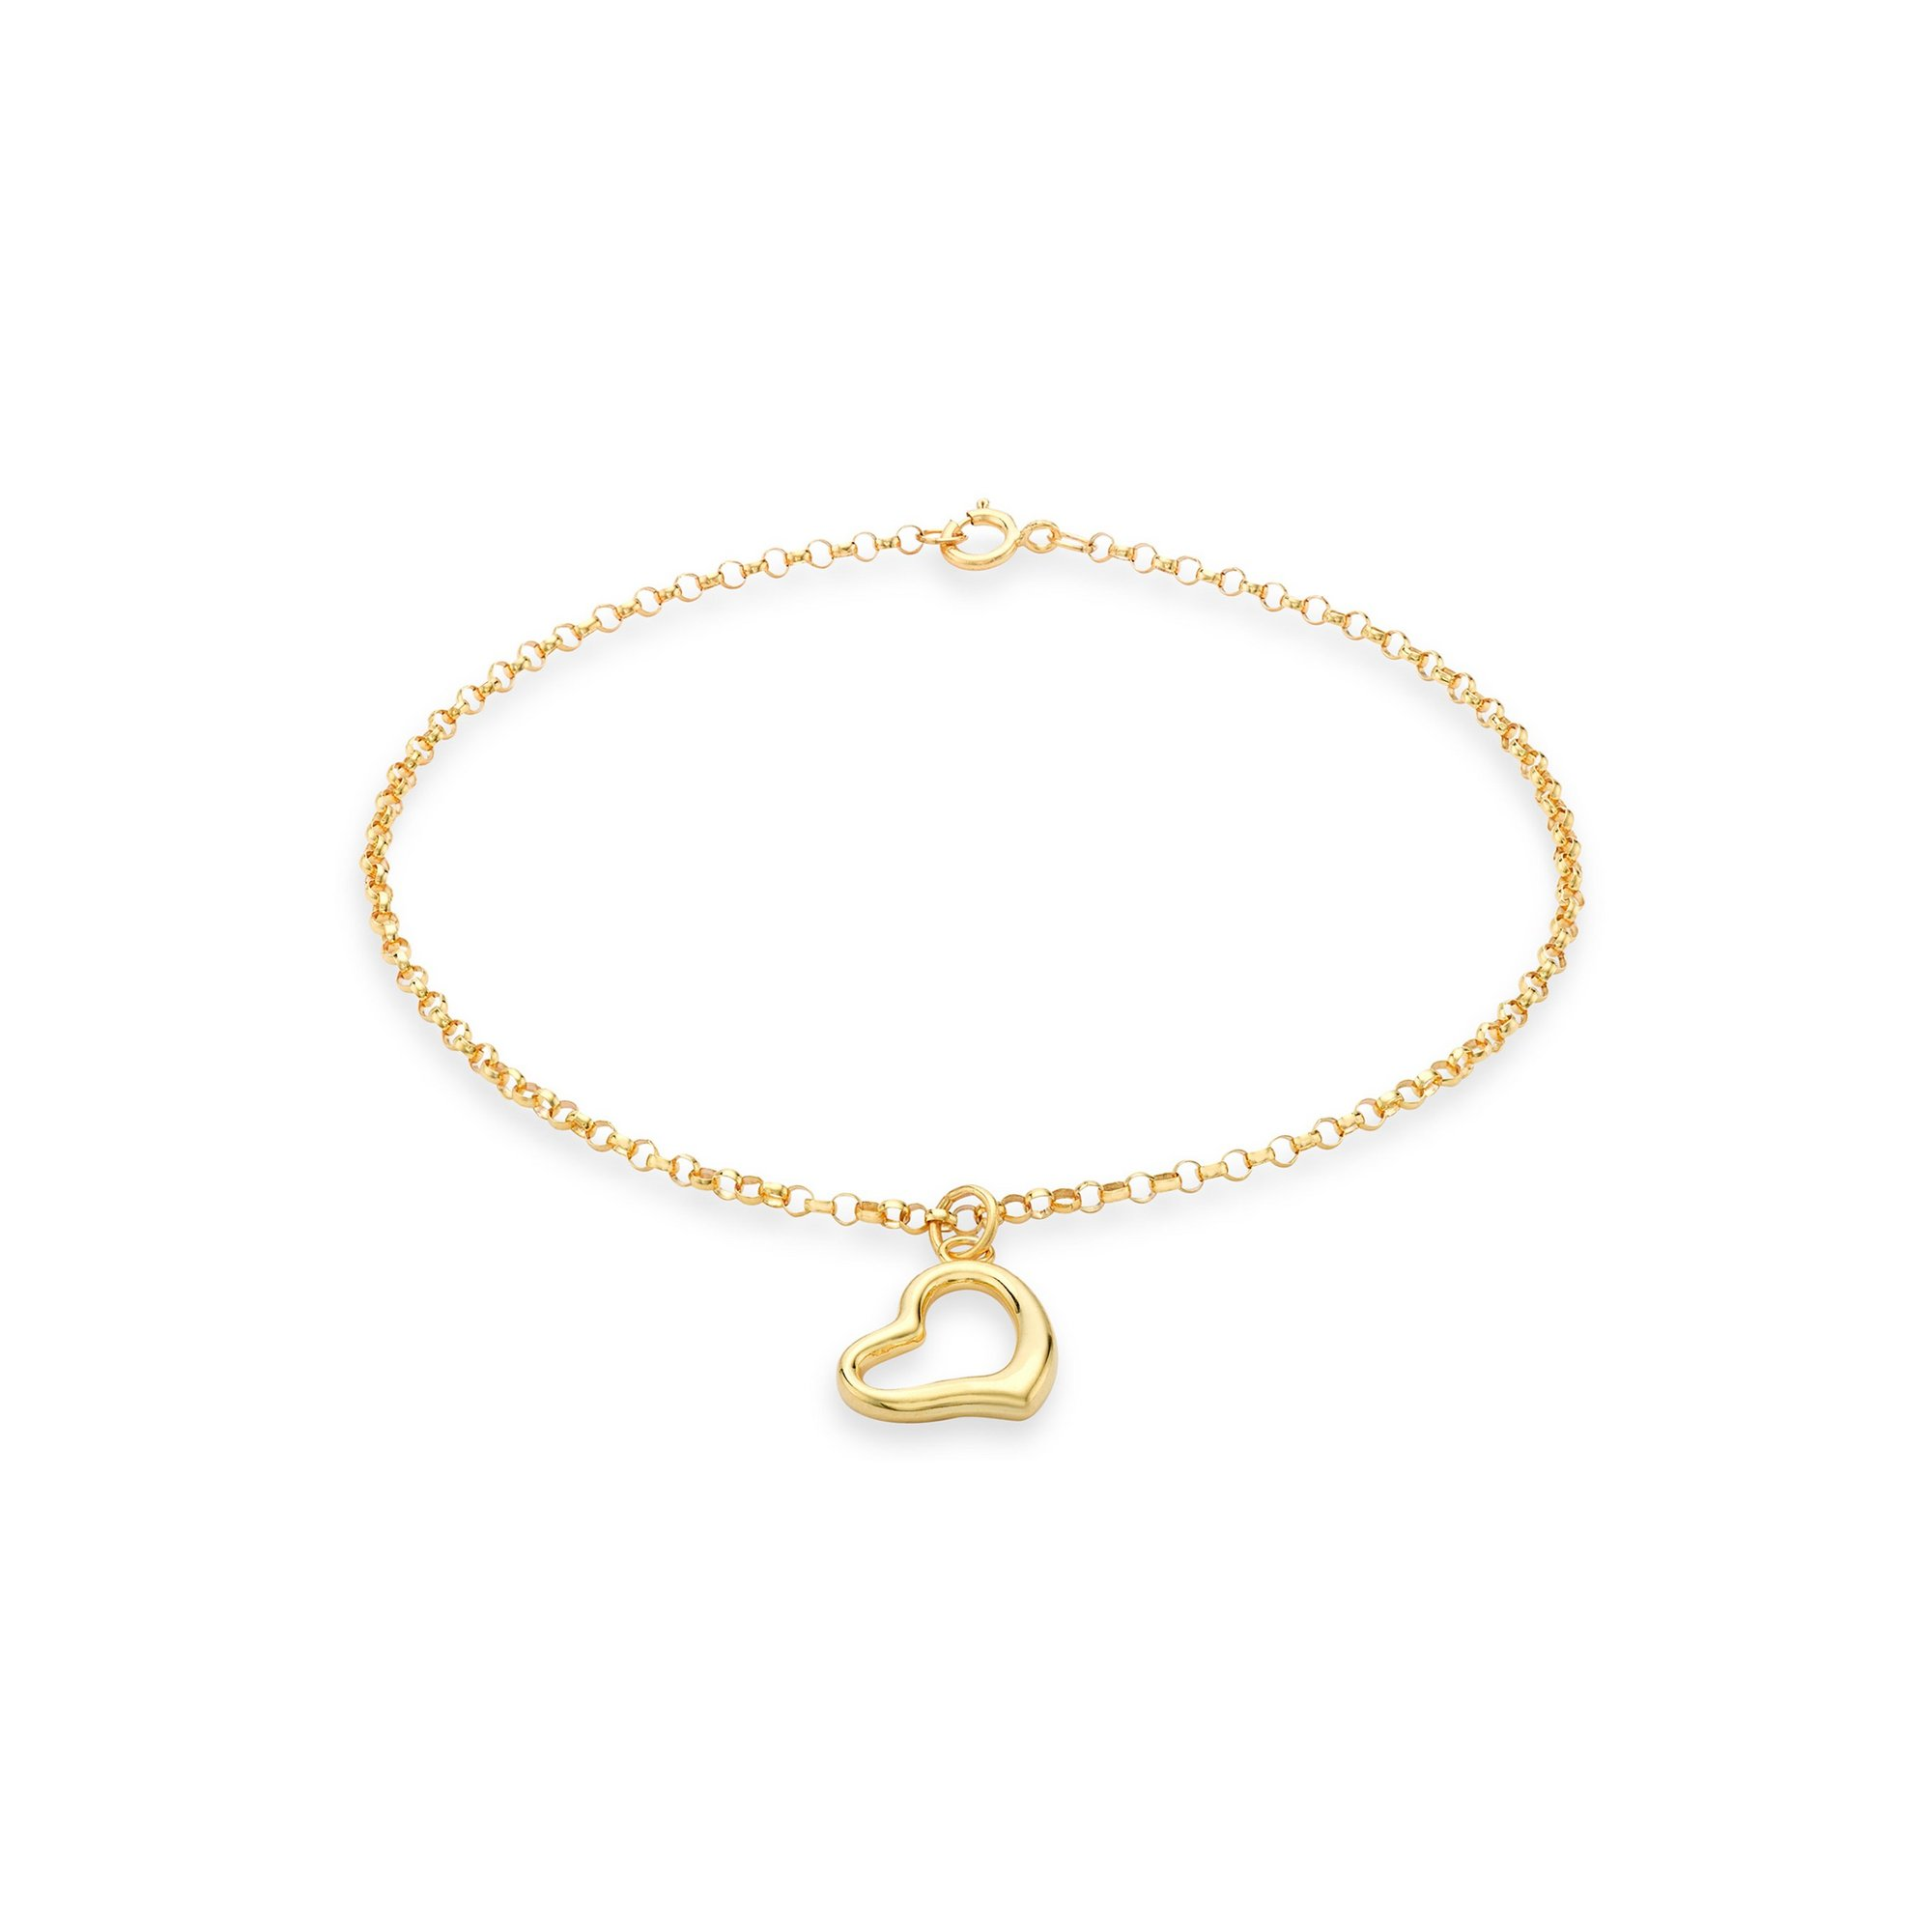 Image of 9ct Gold Heart Charm Round Belcher Chain Bracelet